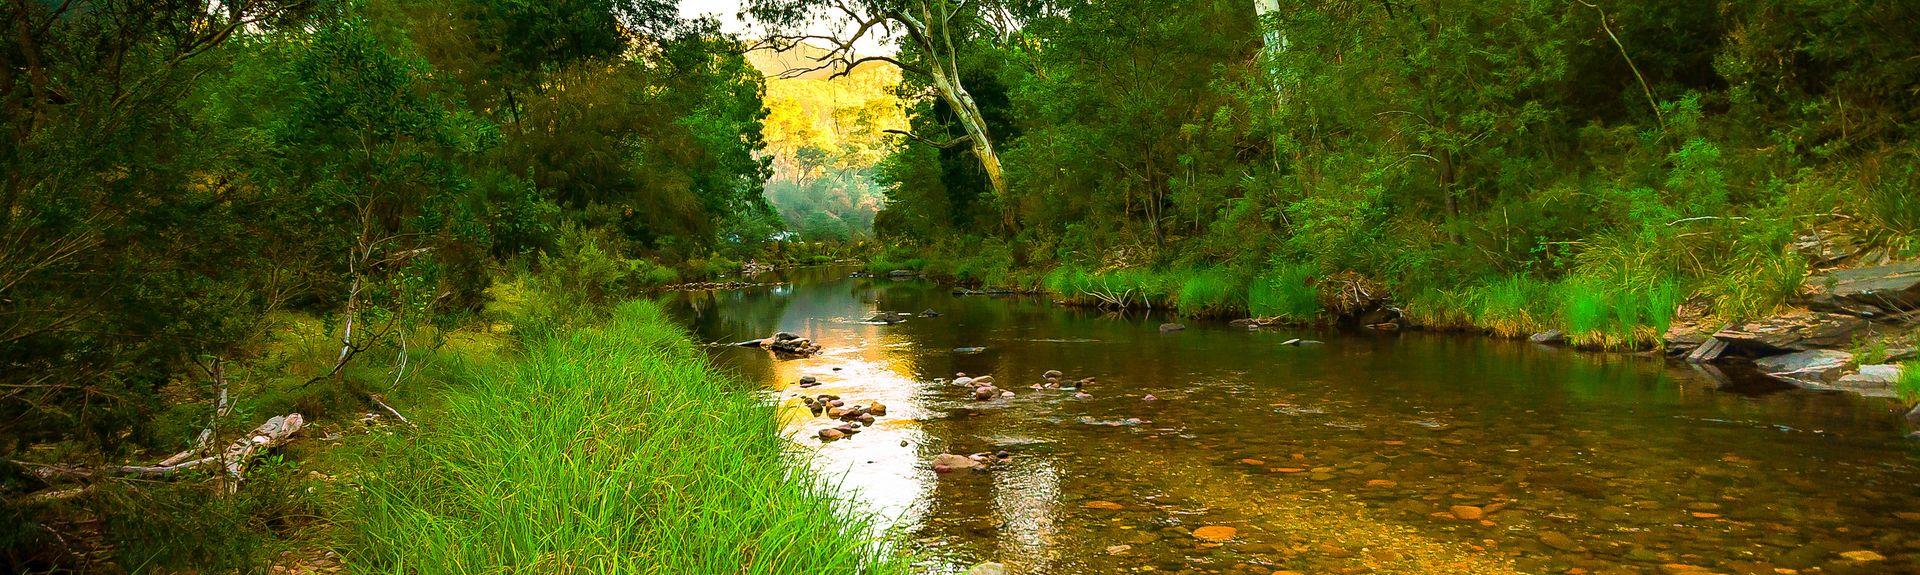 Jamieson VIC, Australia